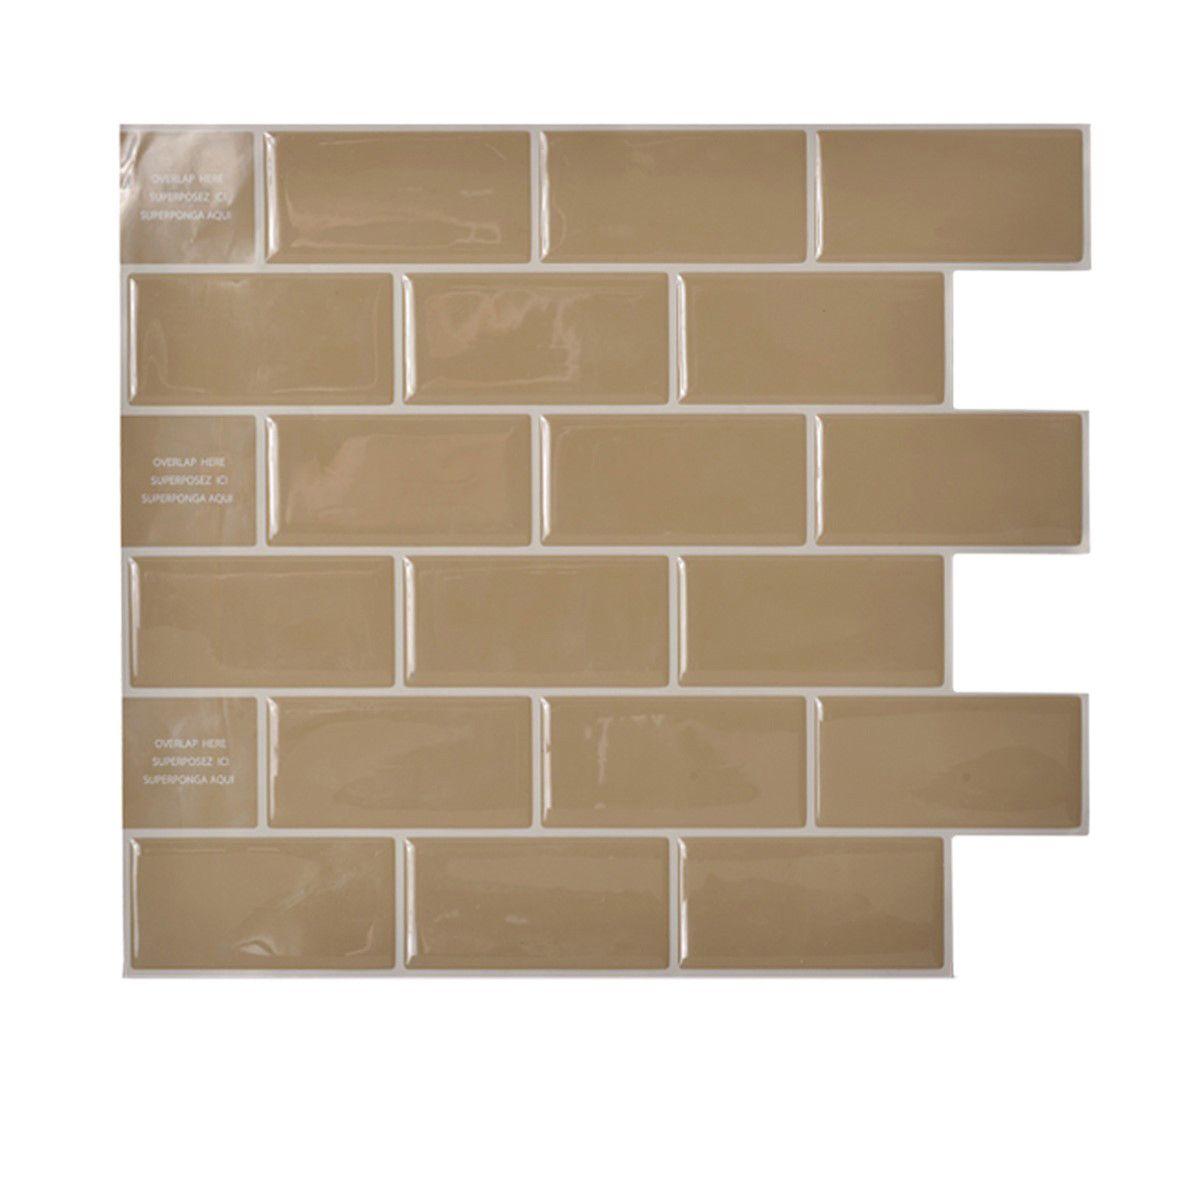 carrelage smart tiles elegant carrelage mural adhsif gel o technologie brevete xcm bellagio. Black Bedroom Furniture Sets. Home Design Ideas